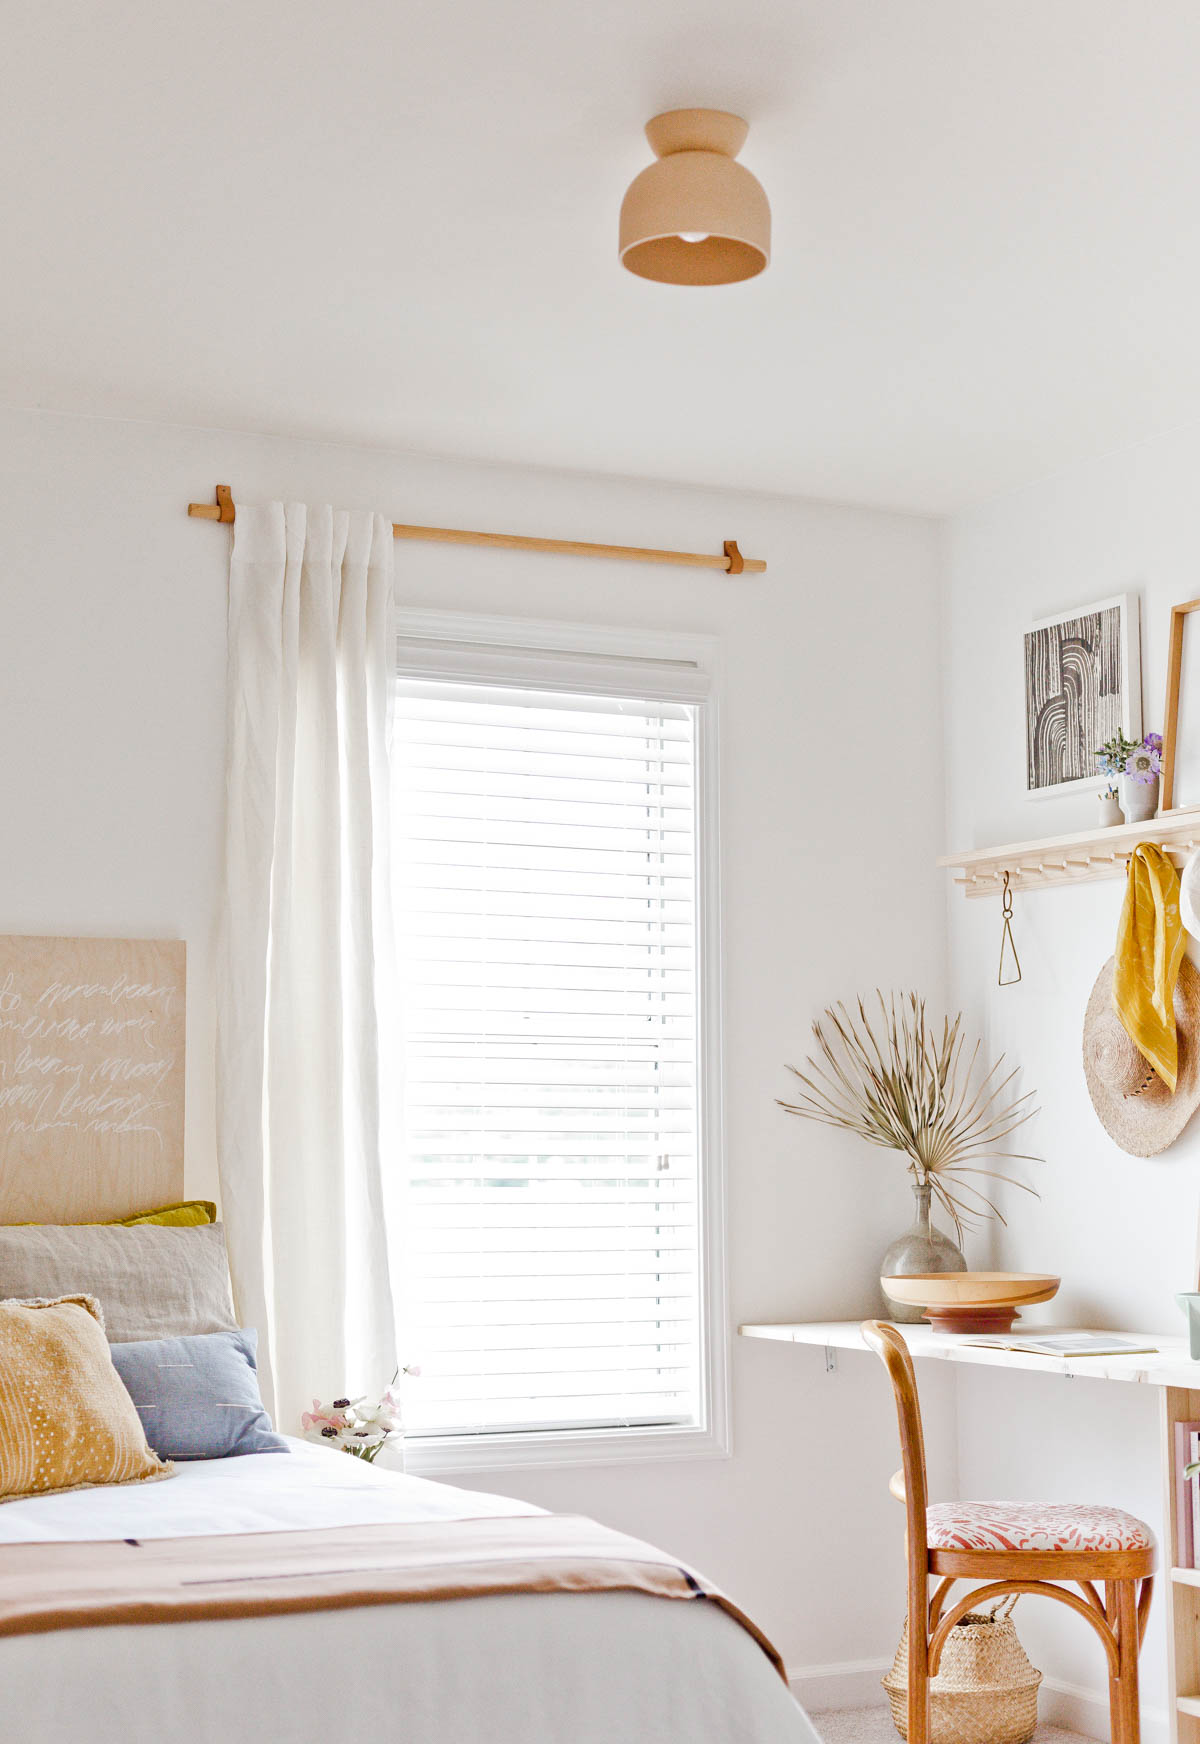 Design-Crush-SeventhandOak-Renter-Friendly-Room-Office.jpg